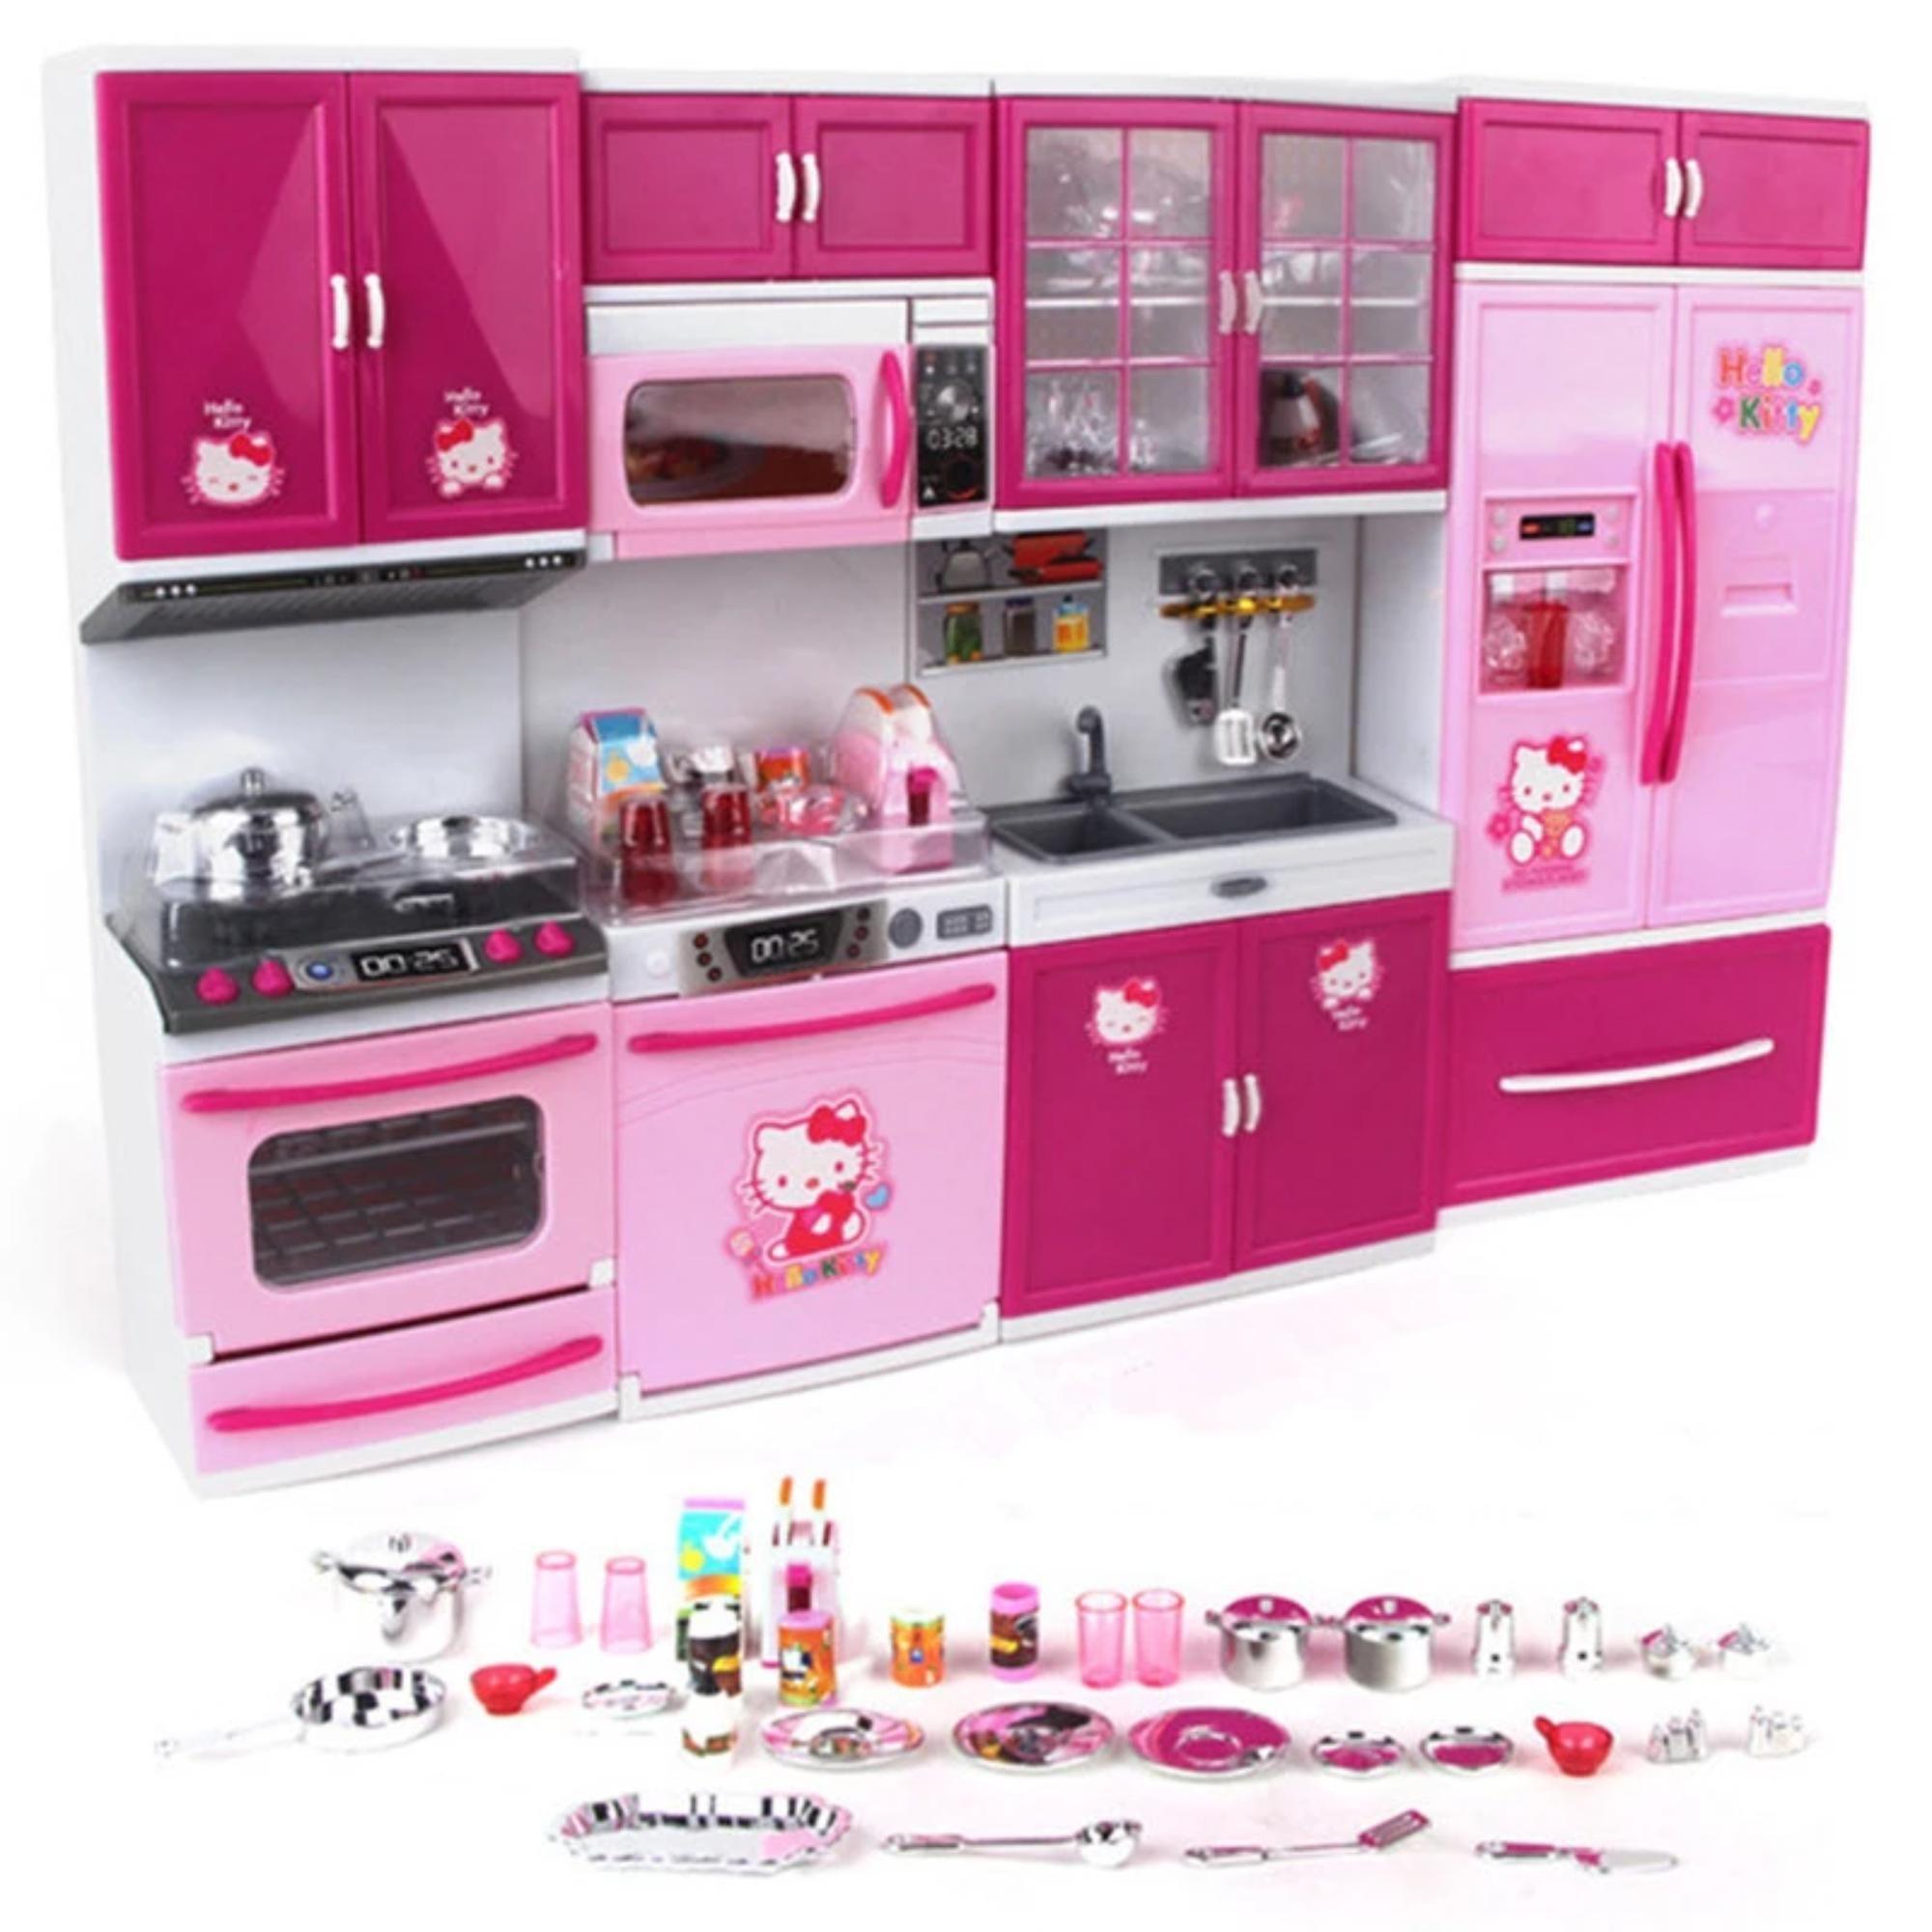 Kitty Kitchen Toys Simulation House Luxury Girl Gift Toy Kitchen Set Toy Kitchen Hello Kitty Kitchen